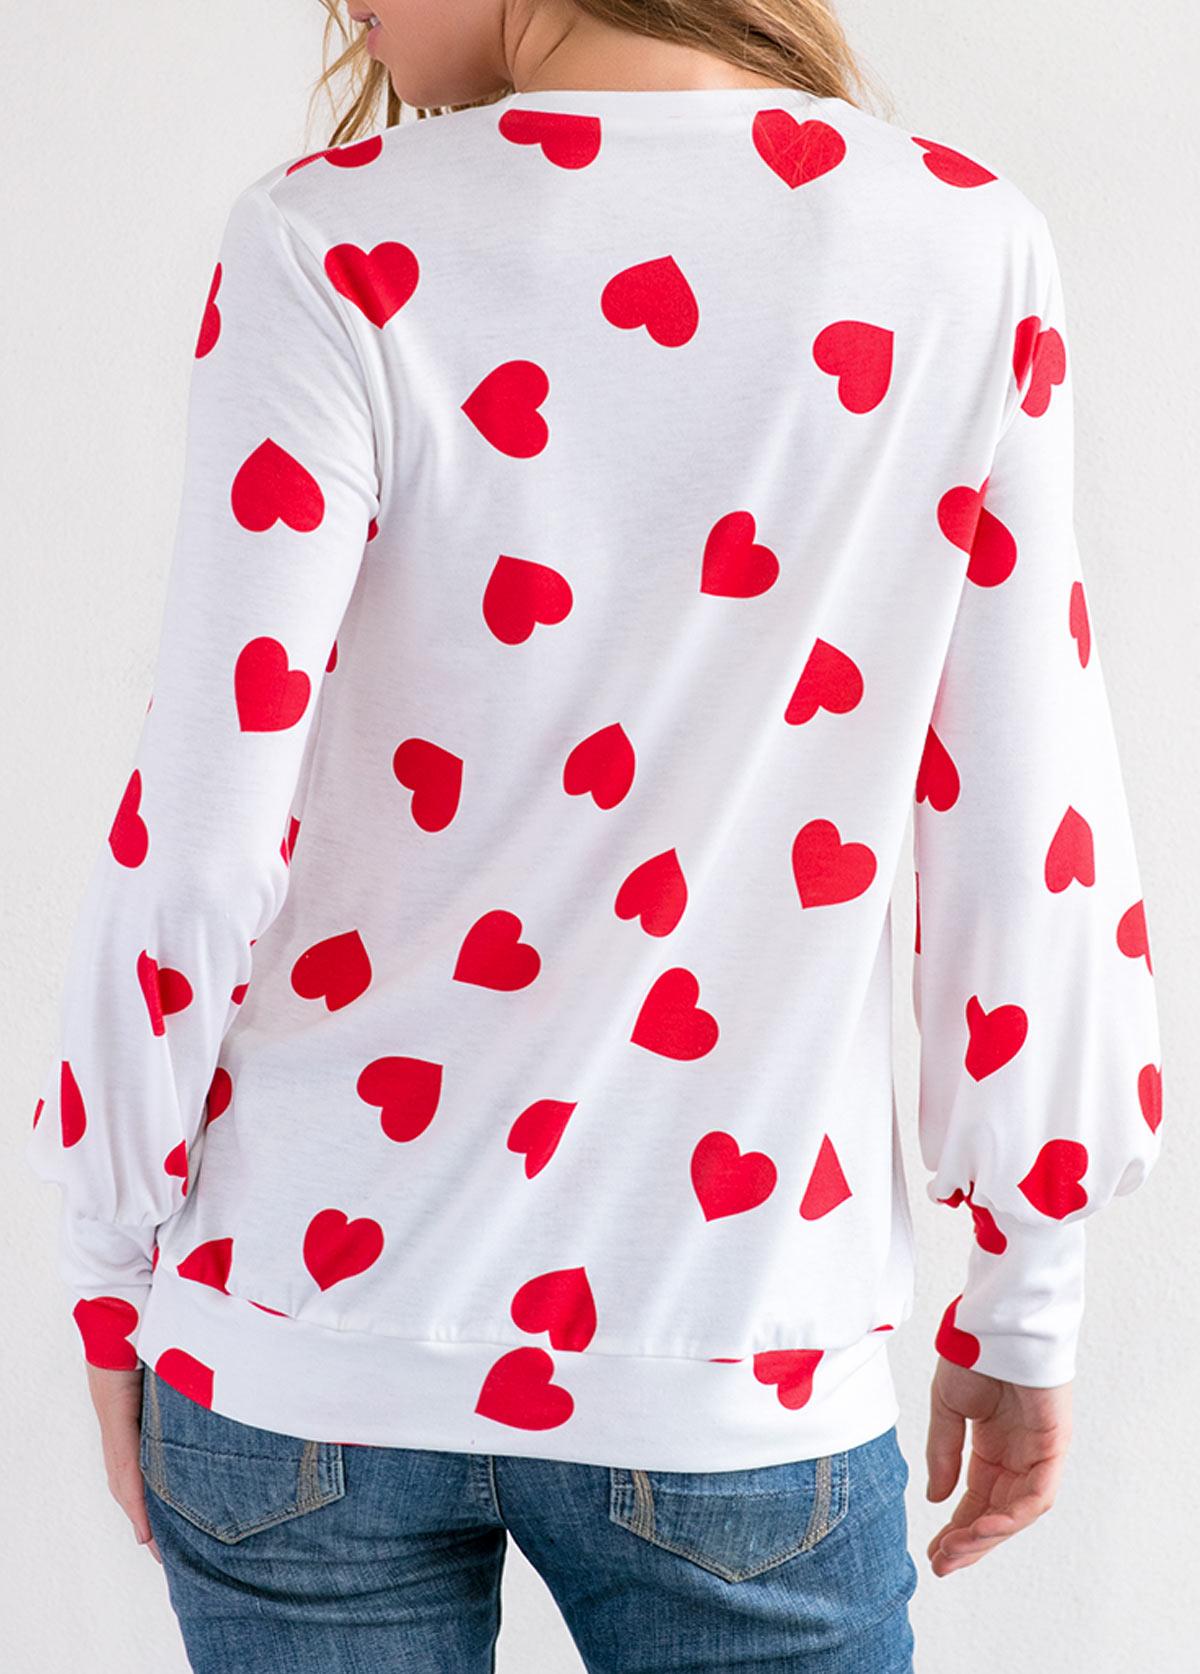 Blouson Sleeve Round Neck Heart Print T Shirt